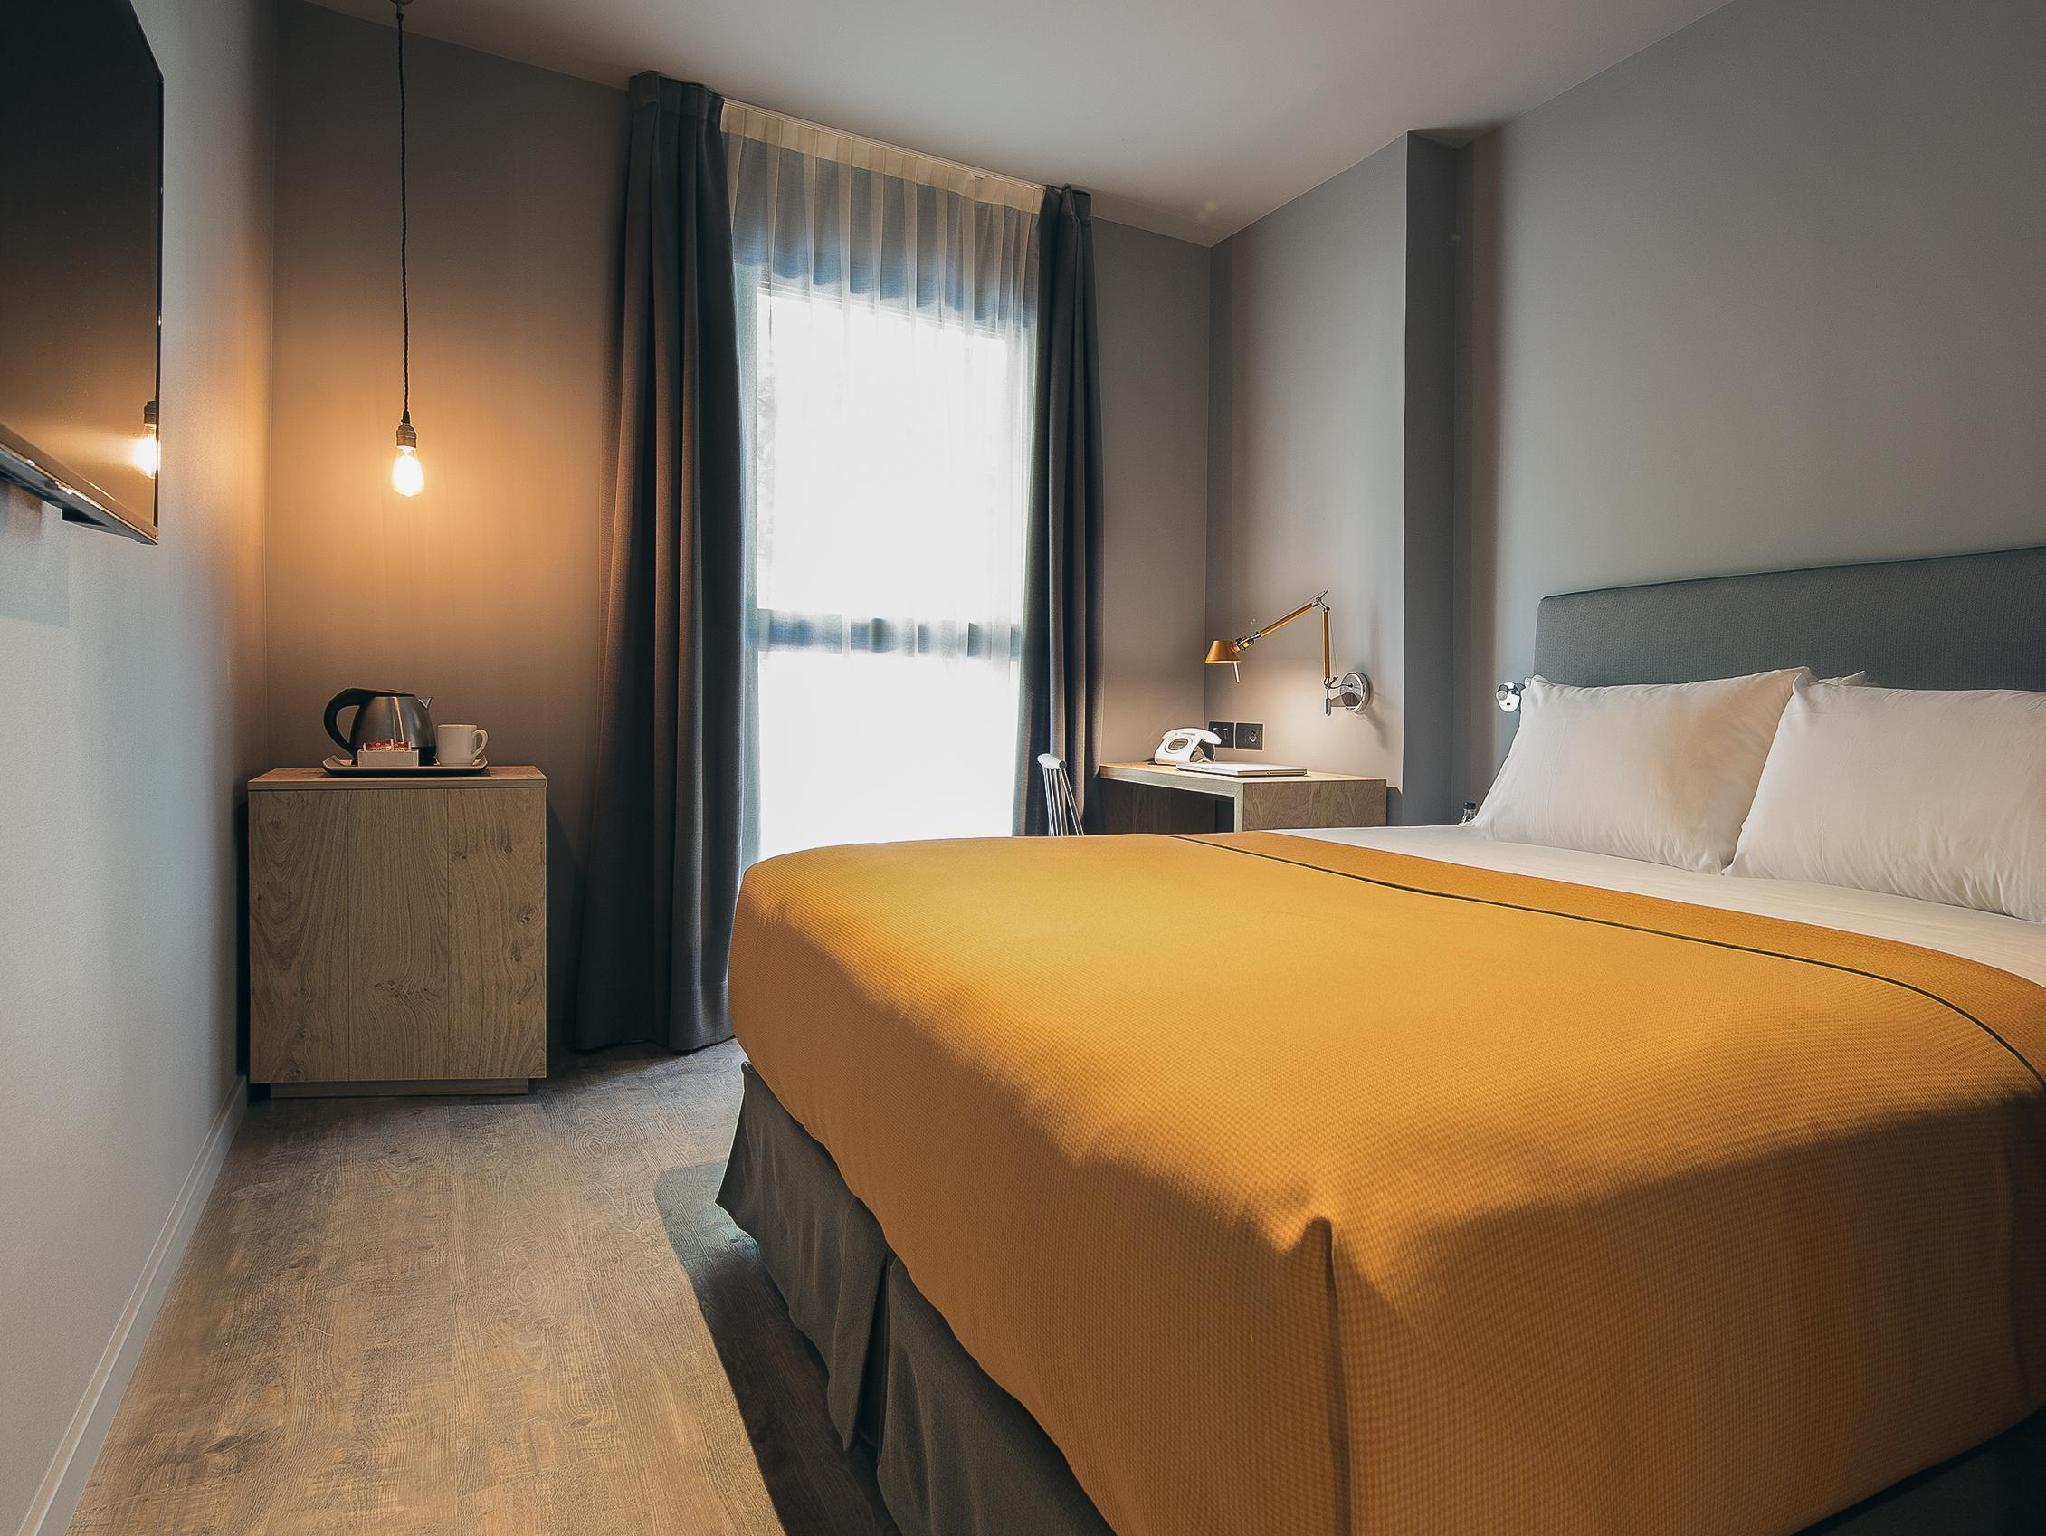 Best Price On Yurbban Trafalgar Hotel In Barcelona Reviews